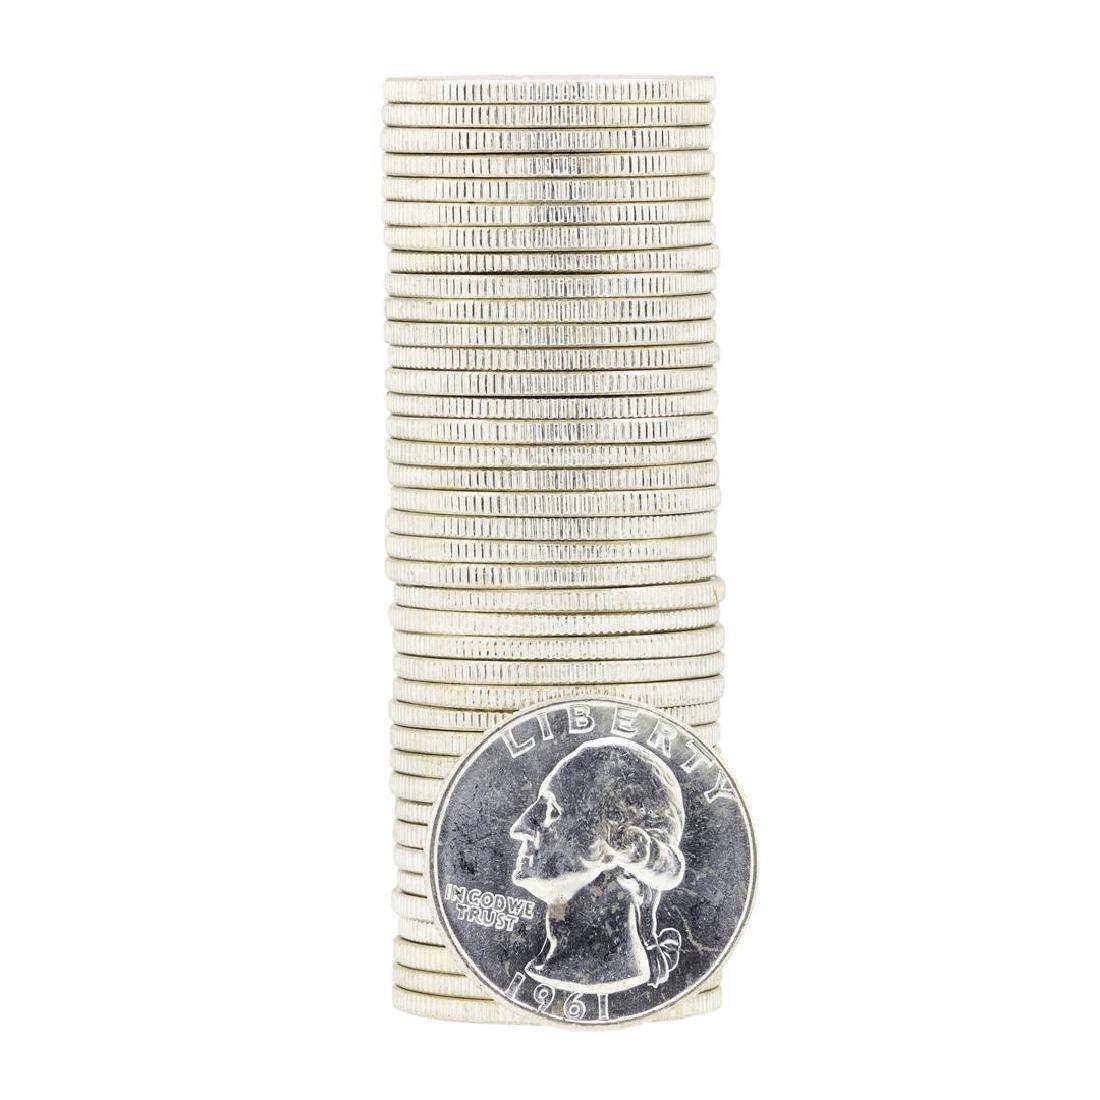 Tube of 40 1961D Washington Quarter Dollars